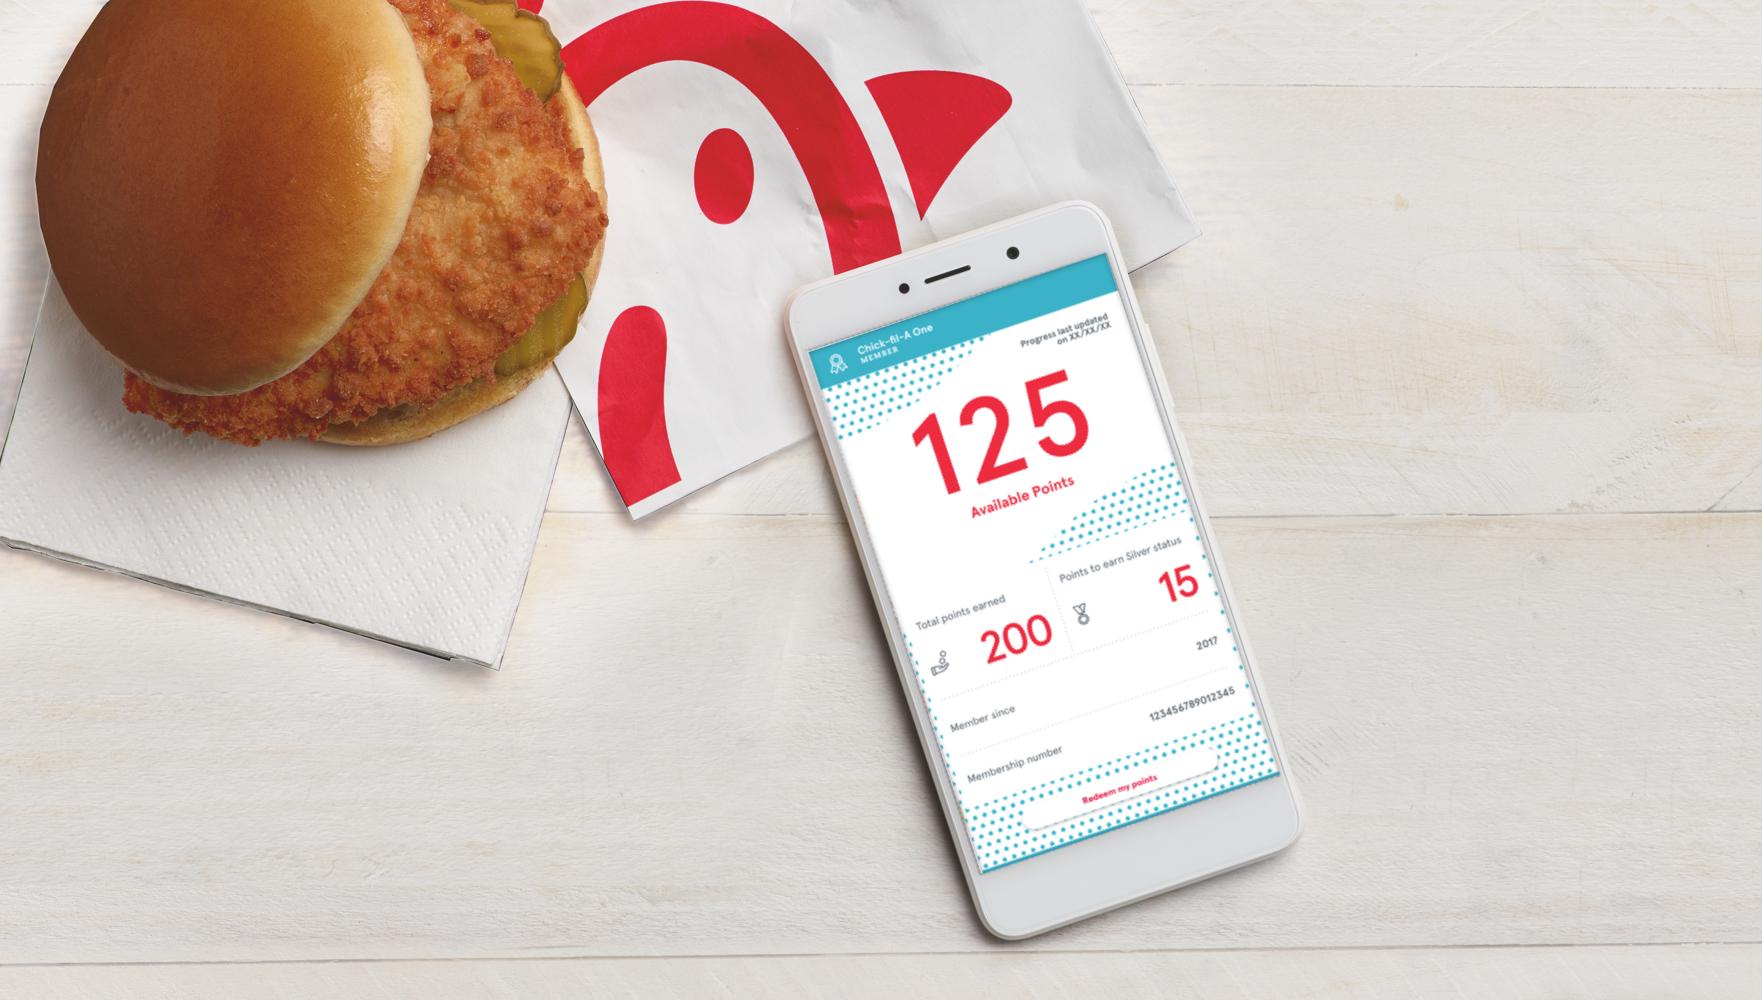 chick-fil-a-sandwich-app